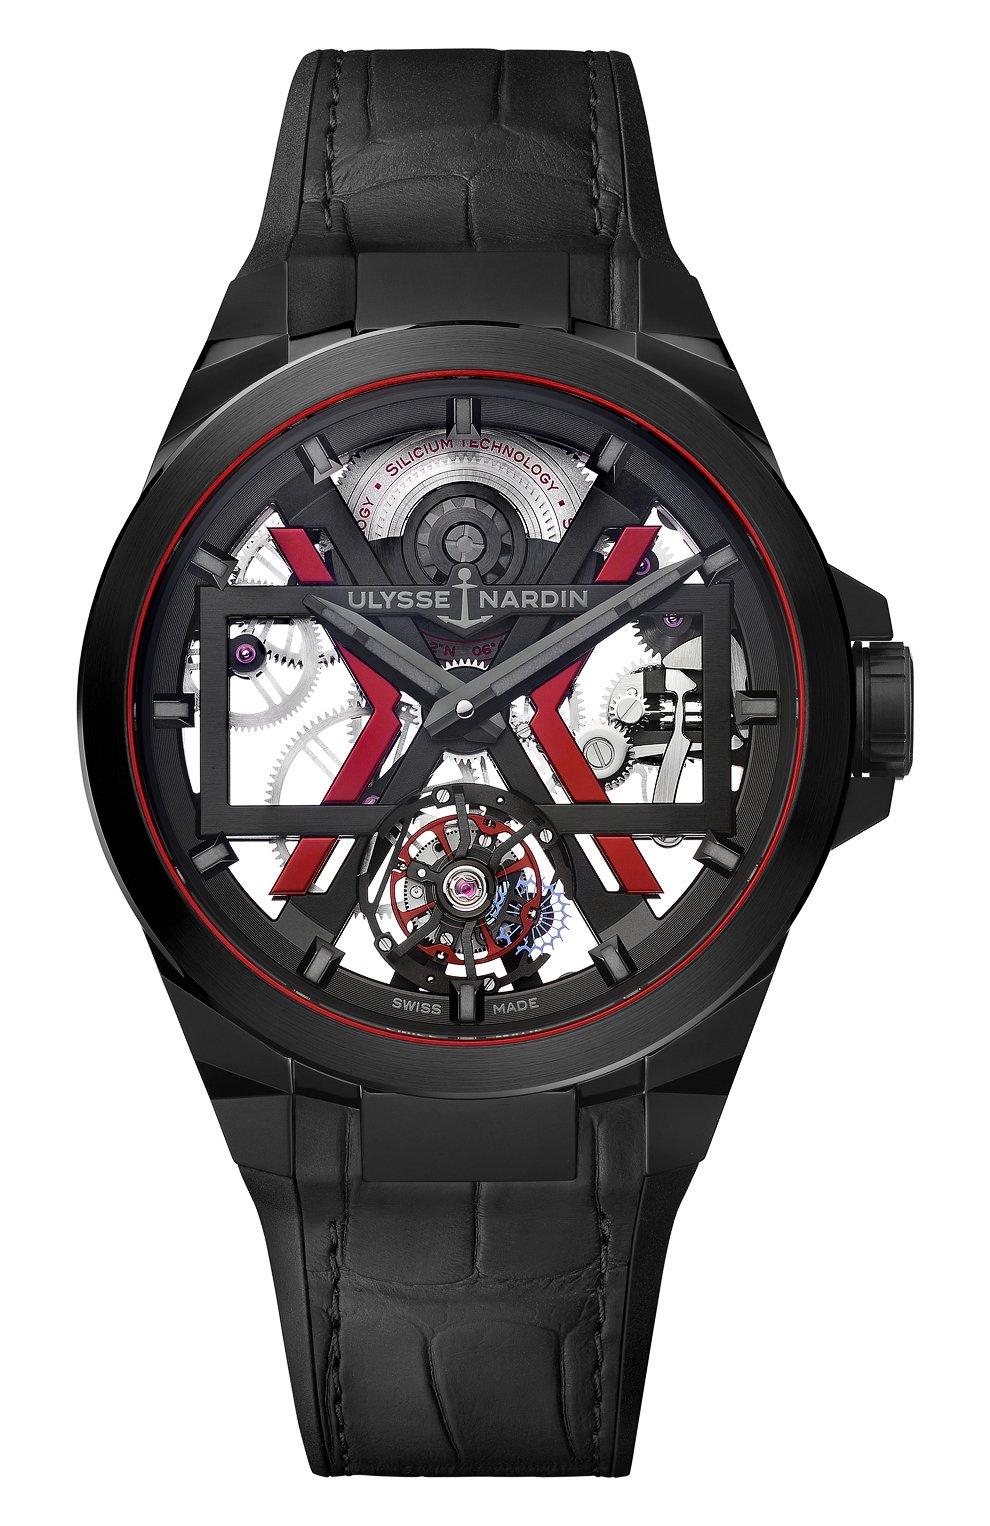 Мужские часы blast ULYSSE NARDIN черного цвета, арт. 1723-400-3A/BLACK | Фото 1